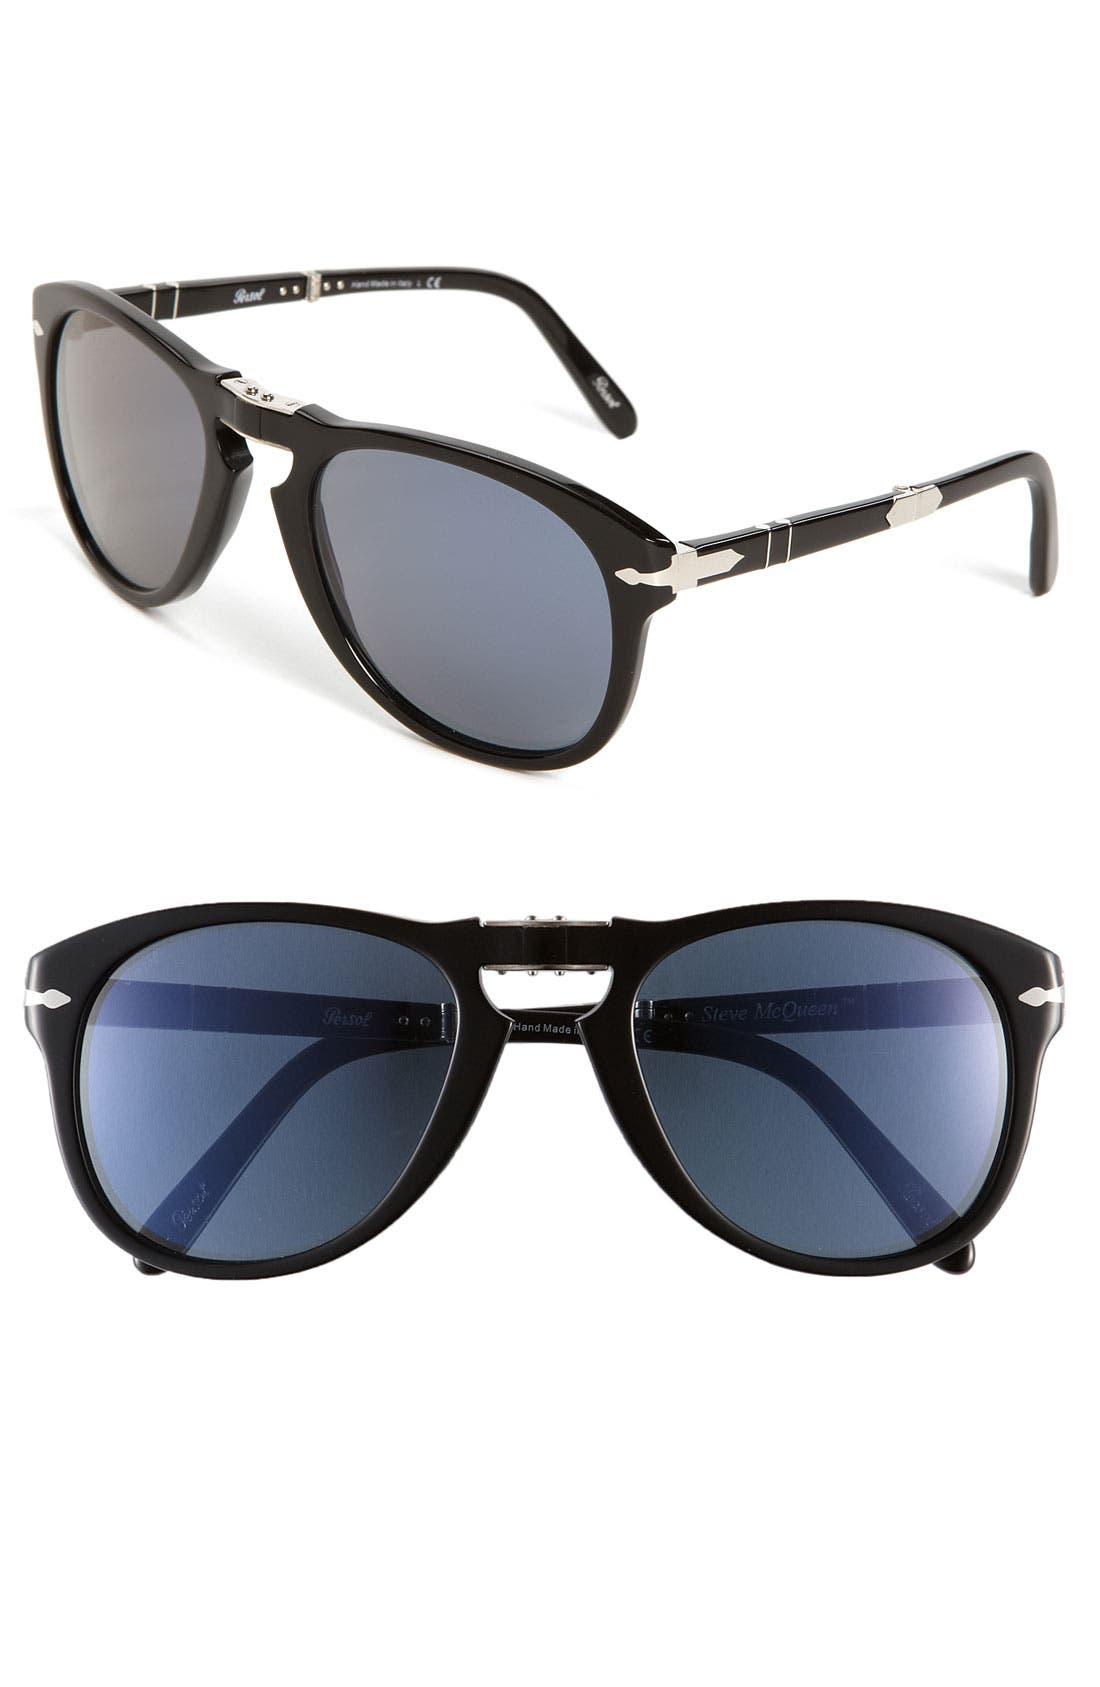 'Steve McQueen<sup>™</sup>' Folding Sunglasses,                             Main thumbnail 1, color,                             014